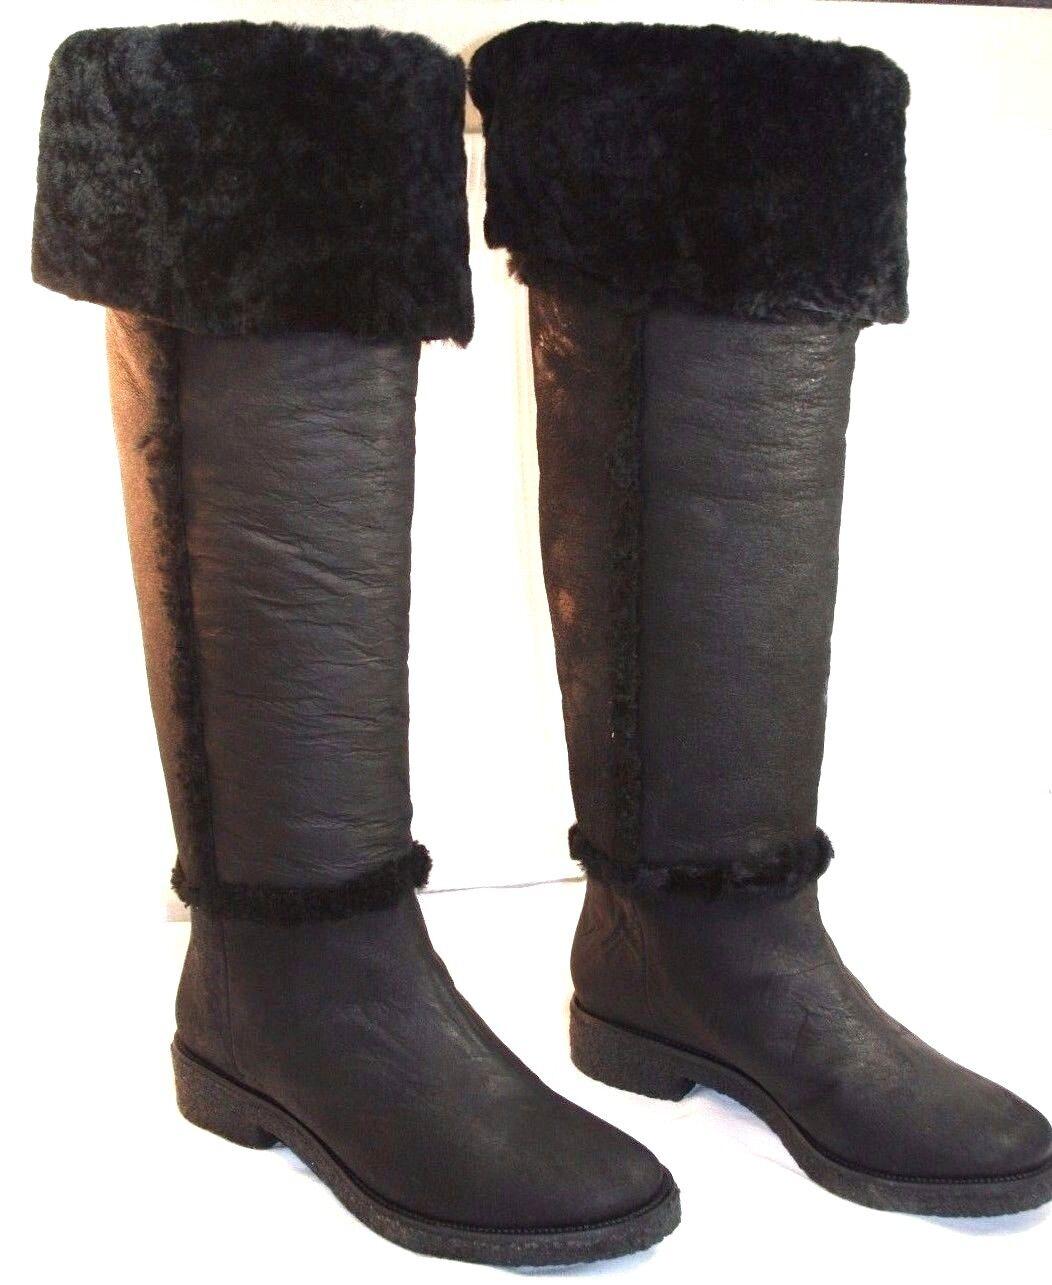 Diane Von Negro Furstenberg  Adele  Negro Von botas De Cuero de Piel de Oveja 7.5 neimanmarcus  675 dd6a63